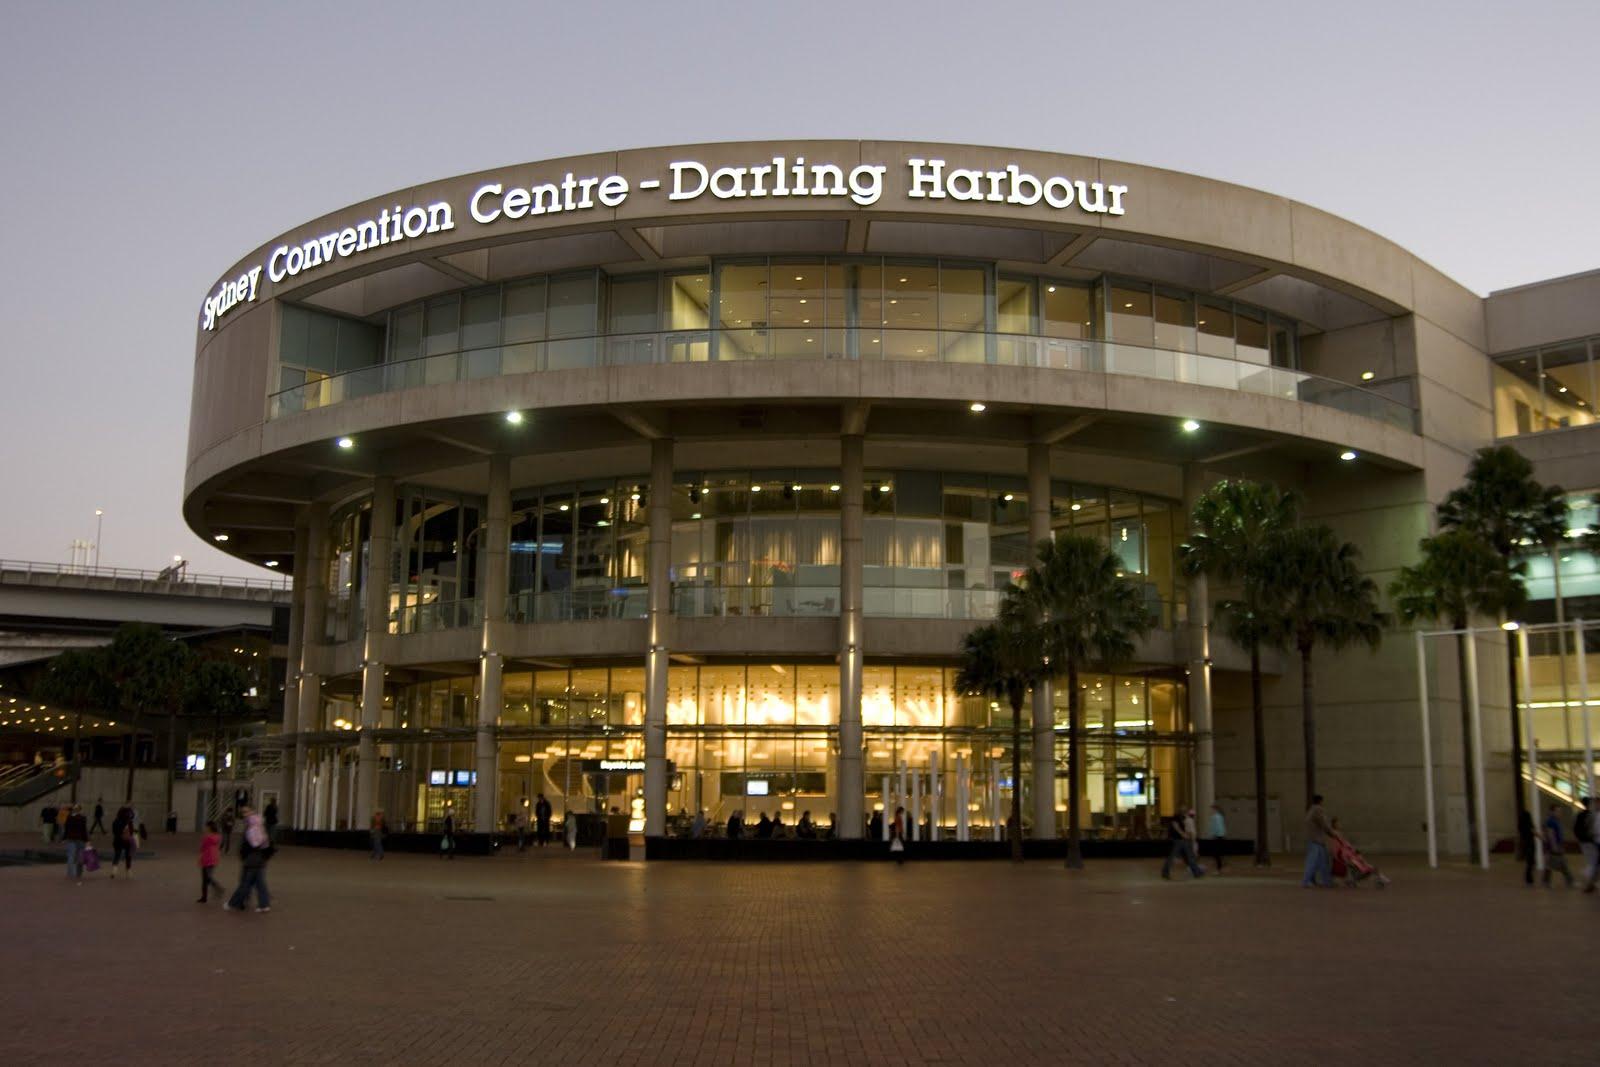 sydney exhibition center location-#6